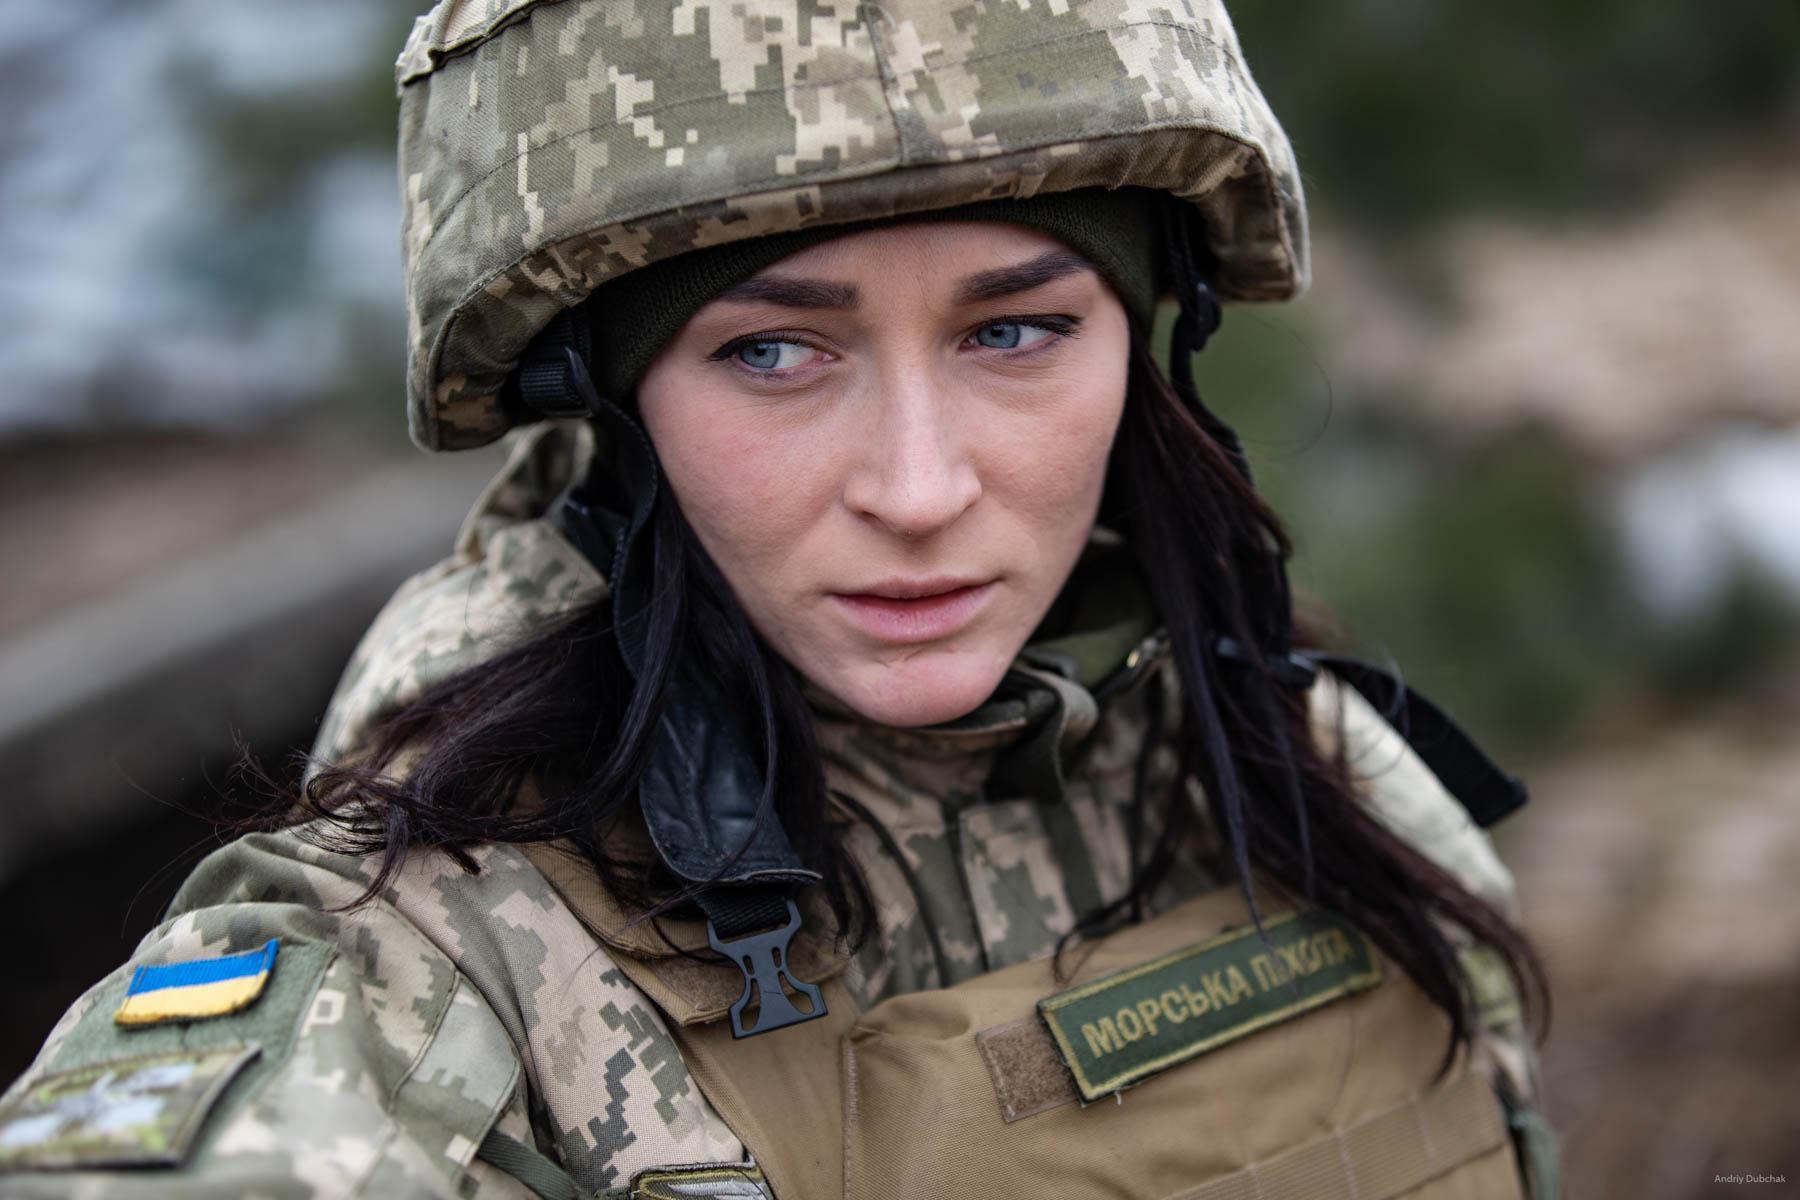 Oleksandra Bessmertnaya, press officer, of the 36th ОМБР of the Marine Corps of Ukraine on the frontline in Shirokine, March 2018.